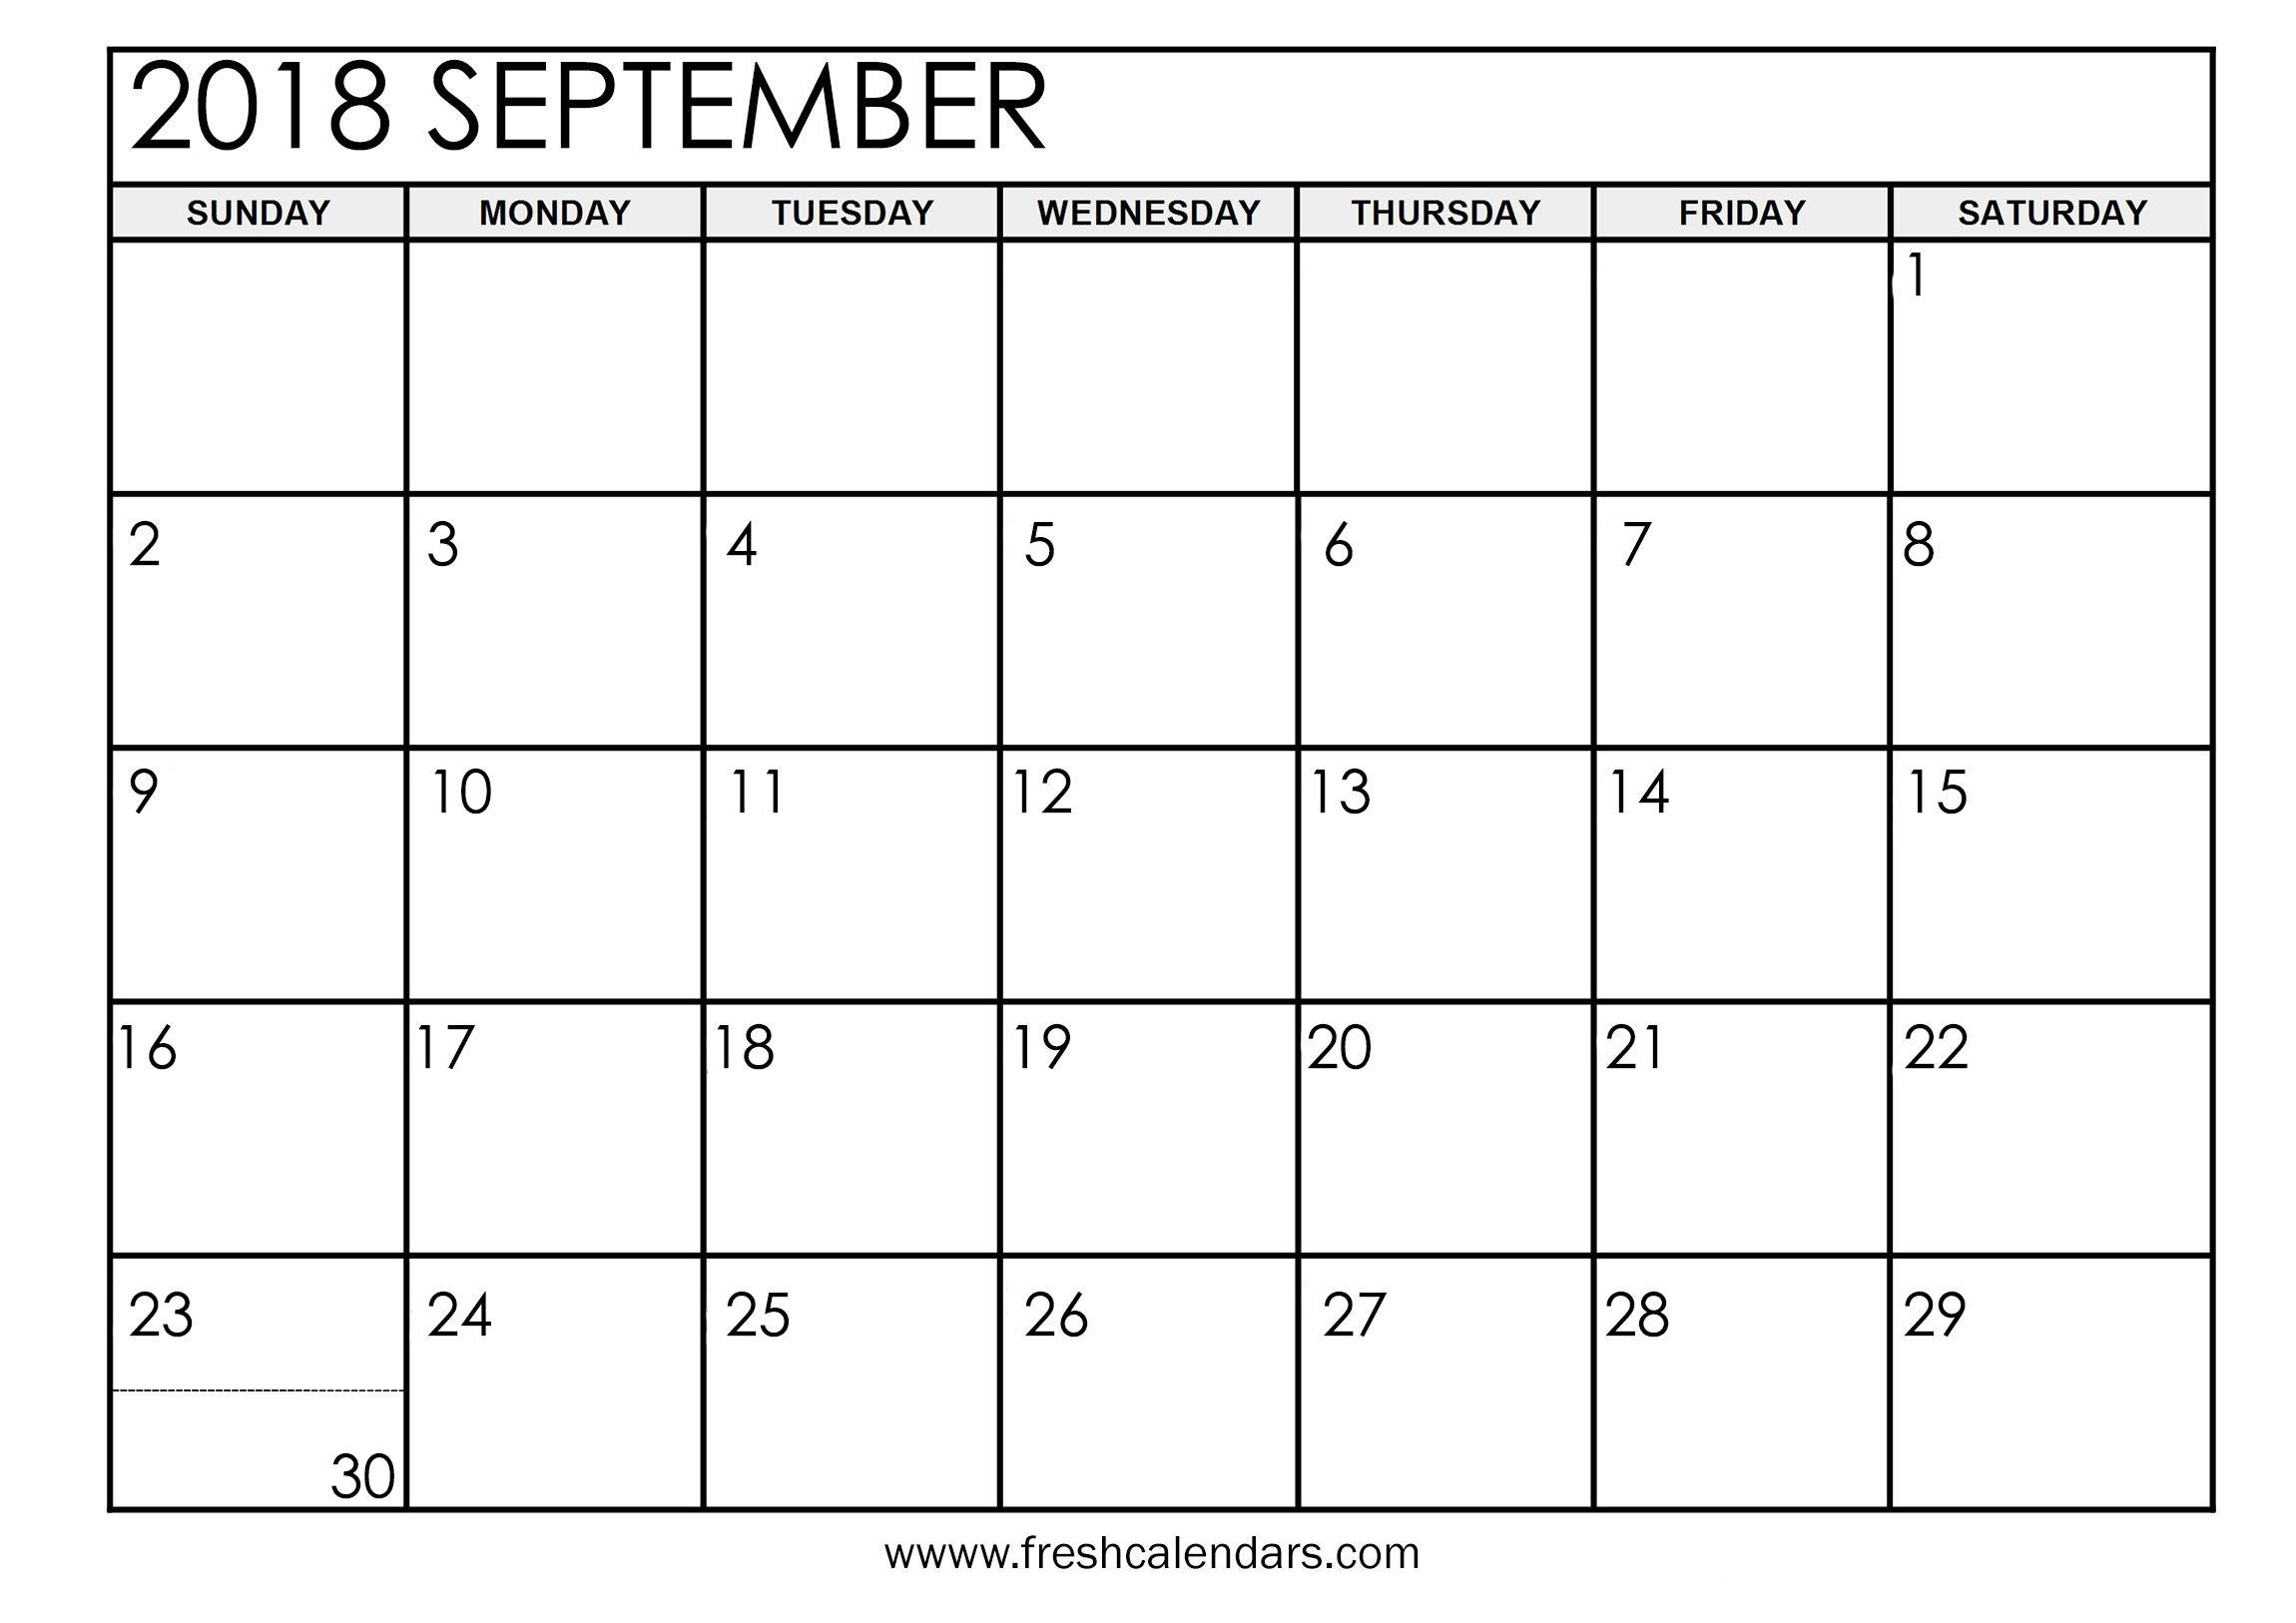 September 2018 Calendar Printable - Fresh Calendars throughout Print Out Of September Calendar